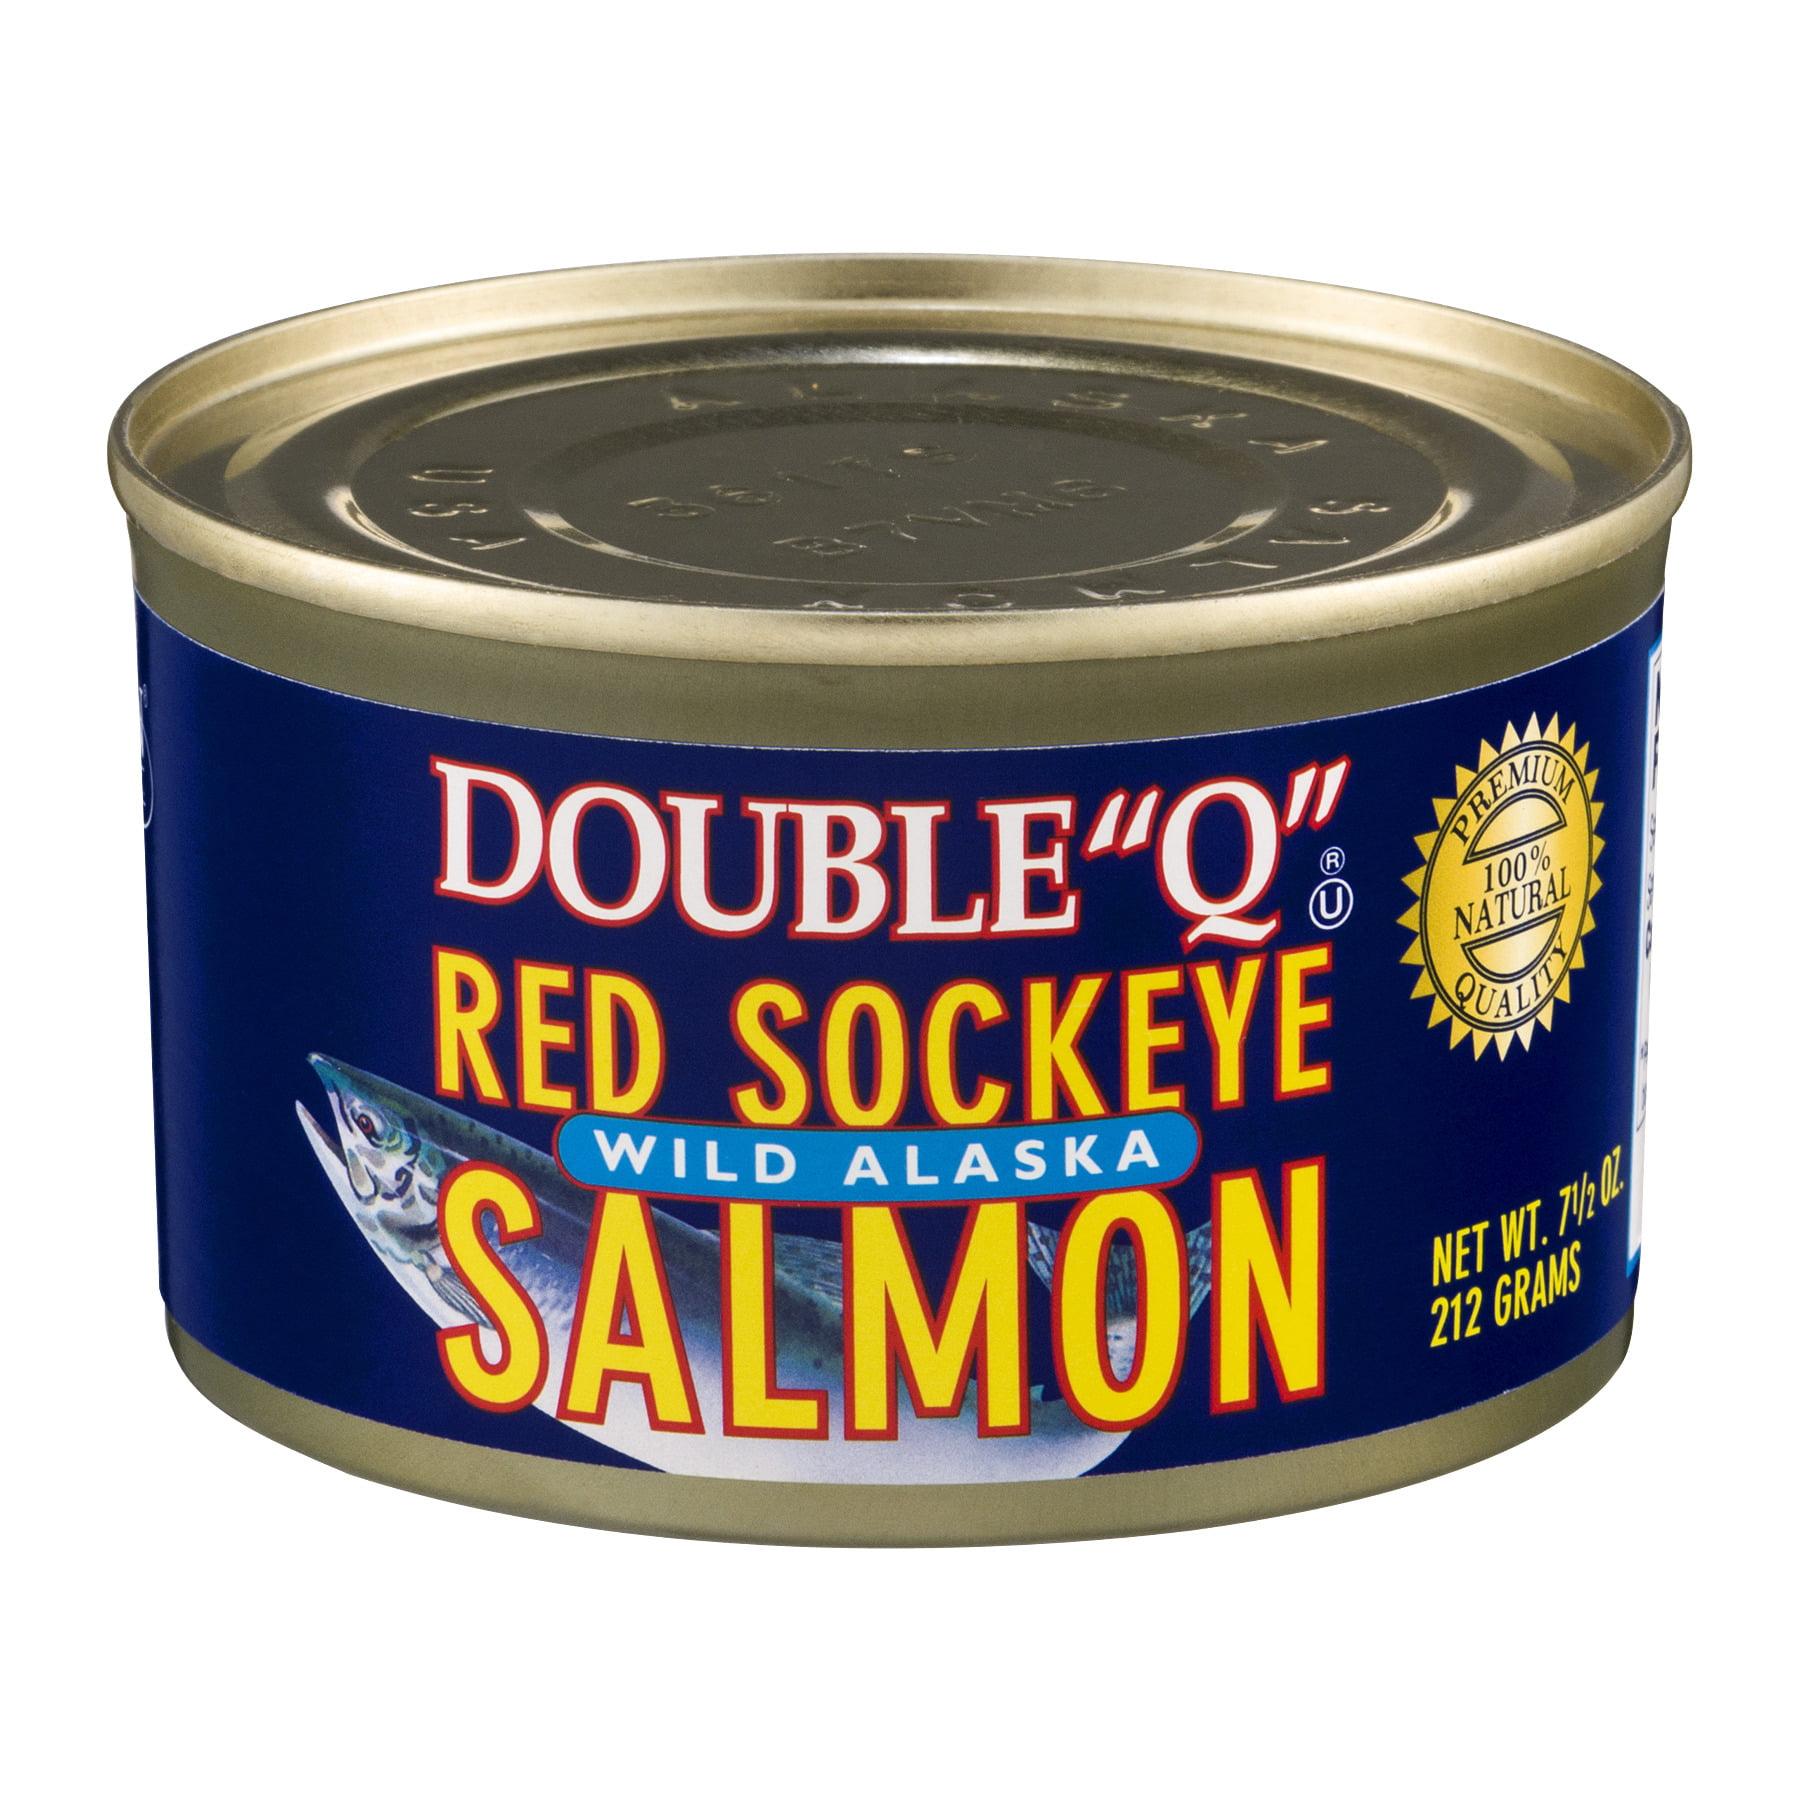 "(2 Pack) Double ""Q"" Wild Alaskan Red Sockeye Salmon, 7.5 oz Can"